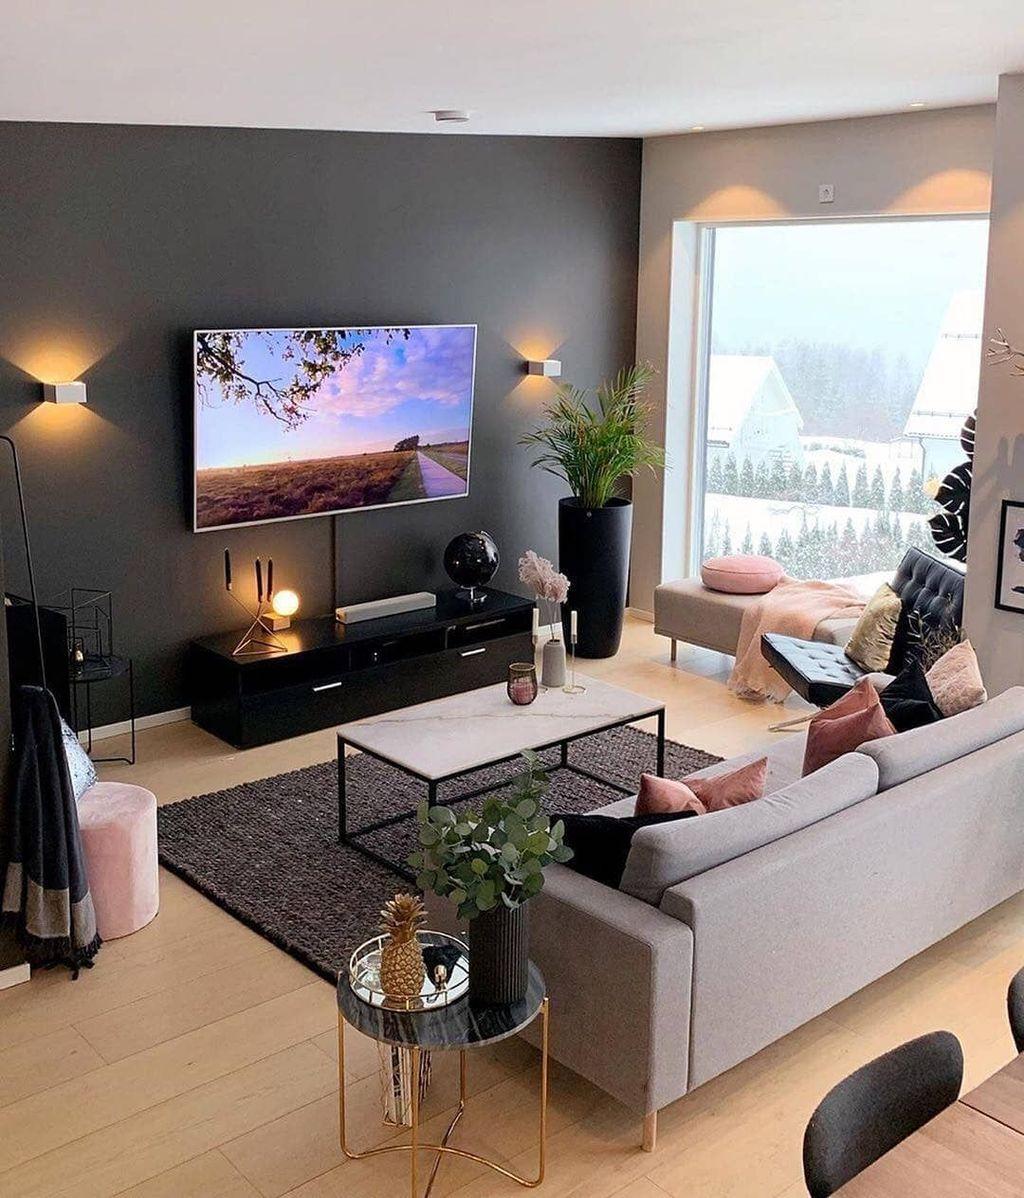 20 Newest Modern Living Room Design Ideas For Your Inspiration Trenduhome Gray Living Room Design Living Room Decor Apartment Contemporary Living Room Design